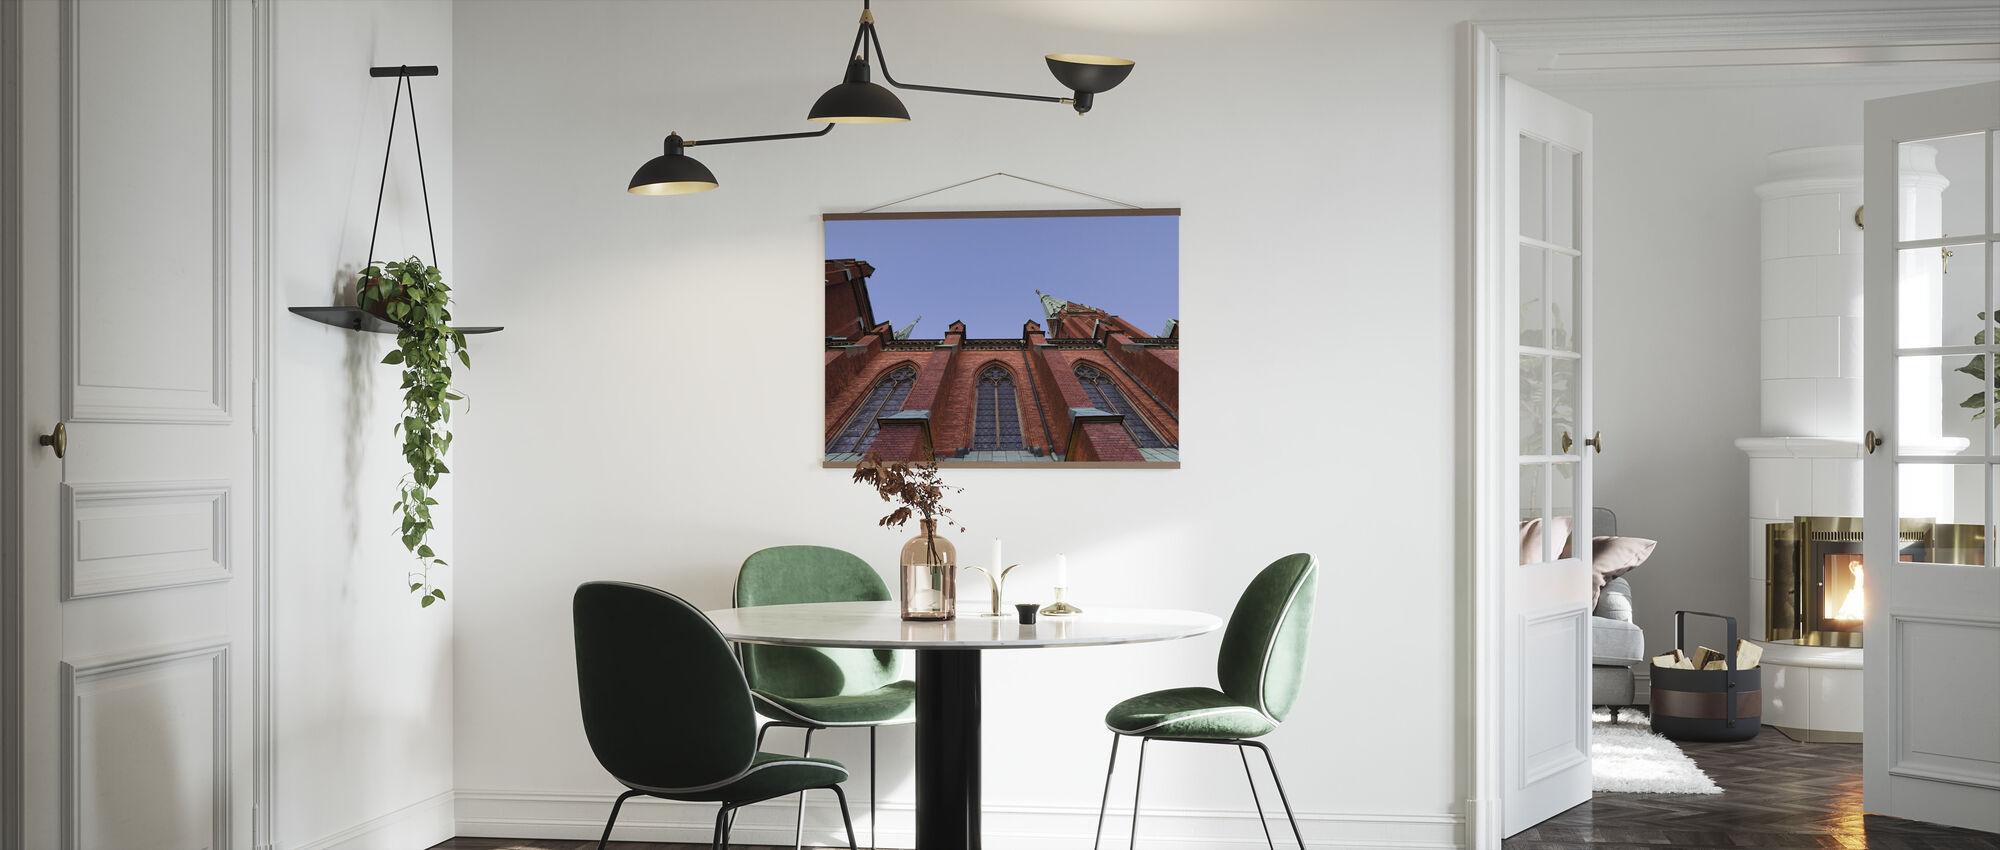 Architectural Details of Johannes Kyrka - Poster - Kitchen